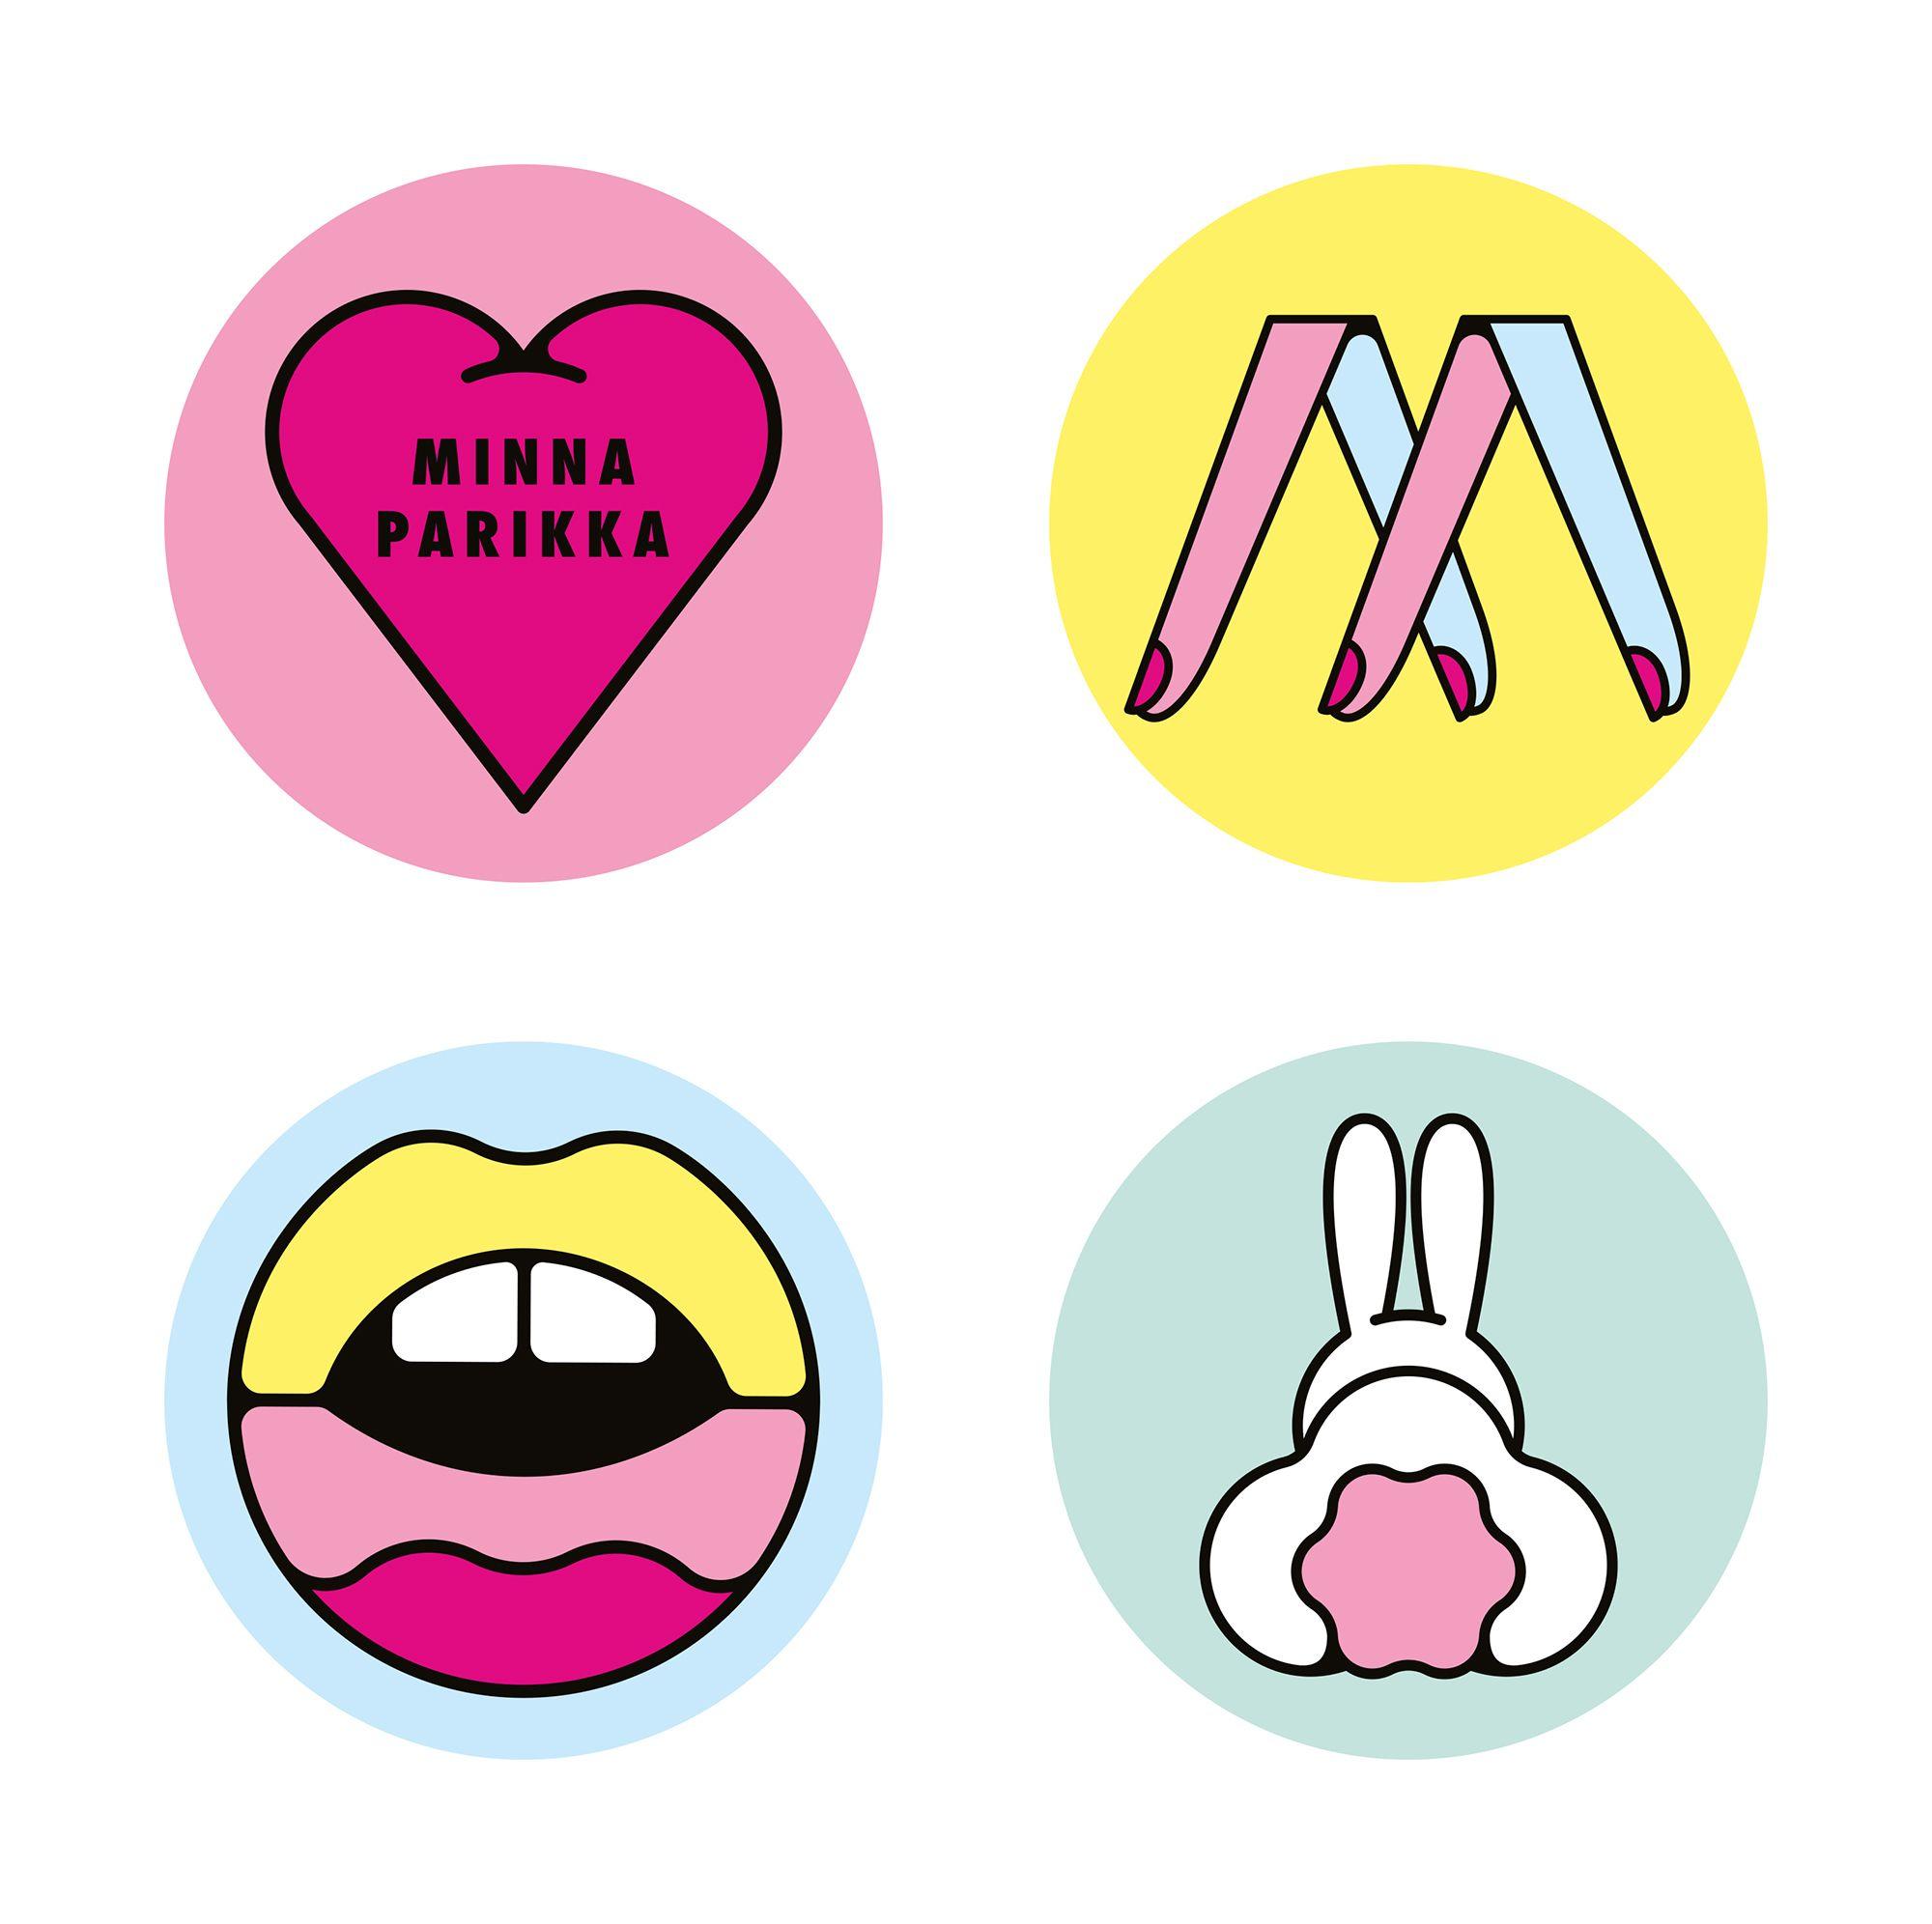 minna parikka stickers by craig amp karl illustration